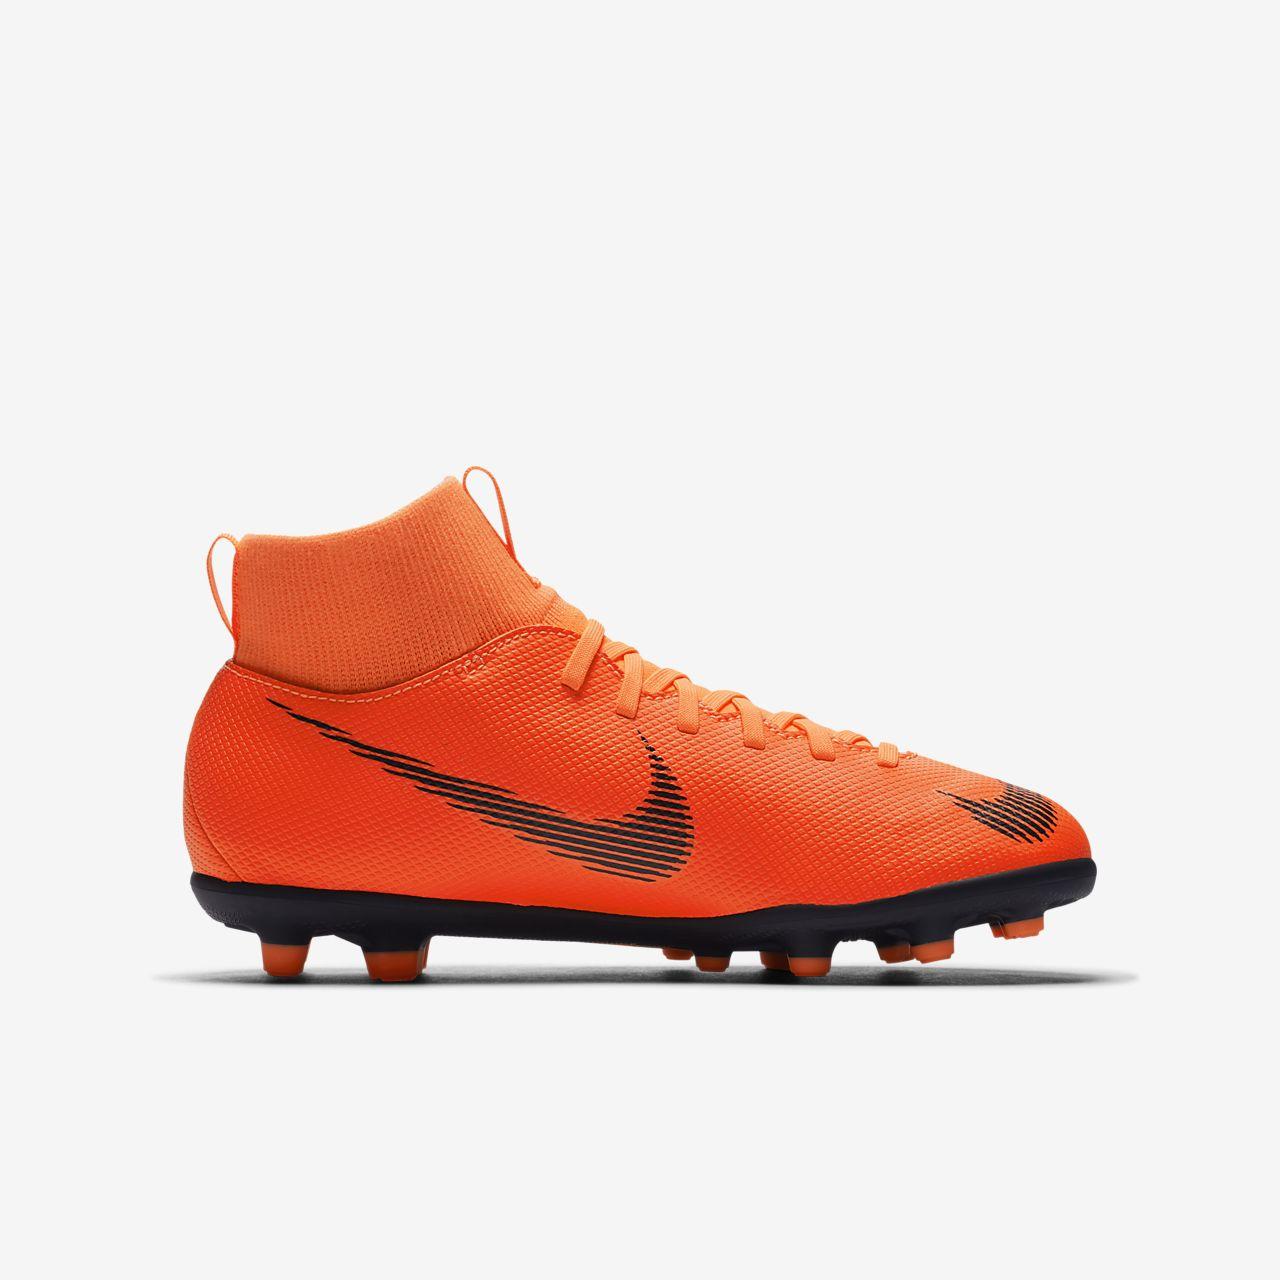 (enfant) Nike Chaussure de football Mercurial Superfly VI Club CR7 MG Junior oatPkHjp